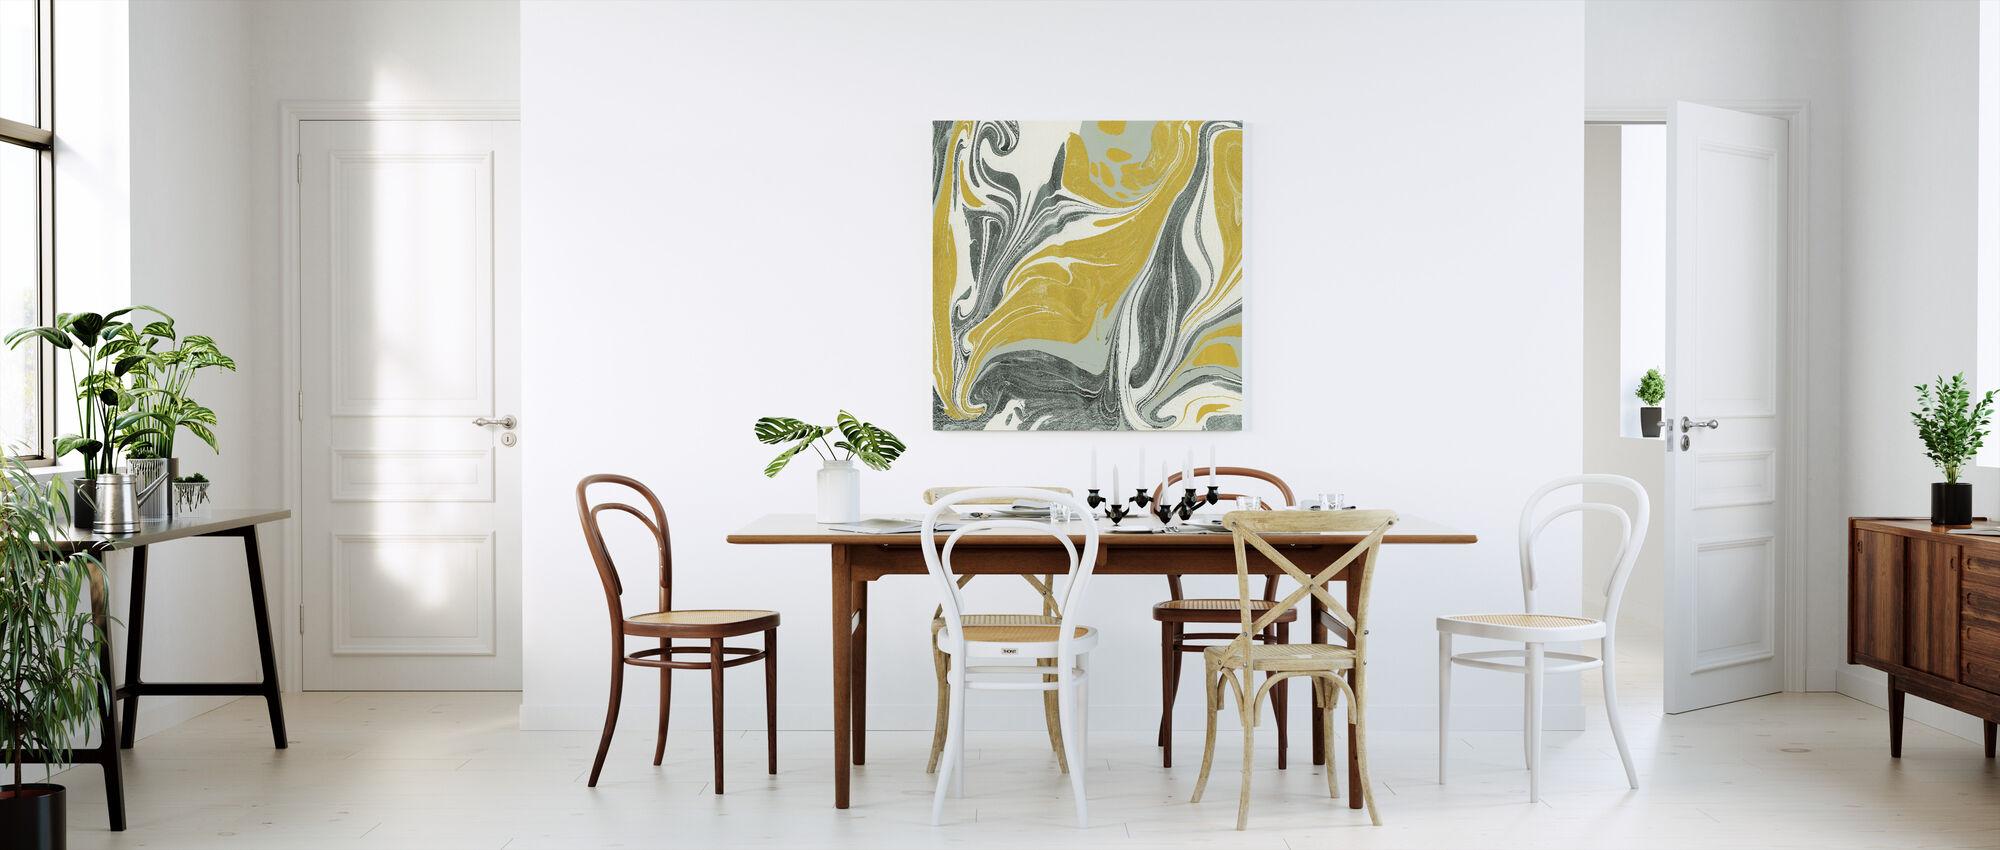 Marmering - Canvas print - Keuken